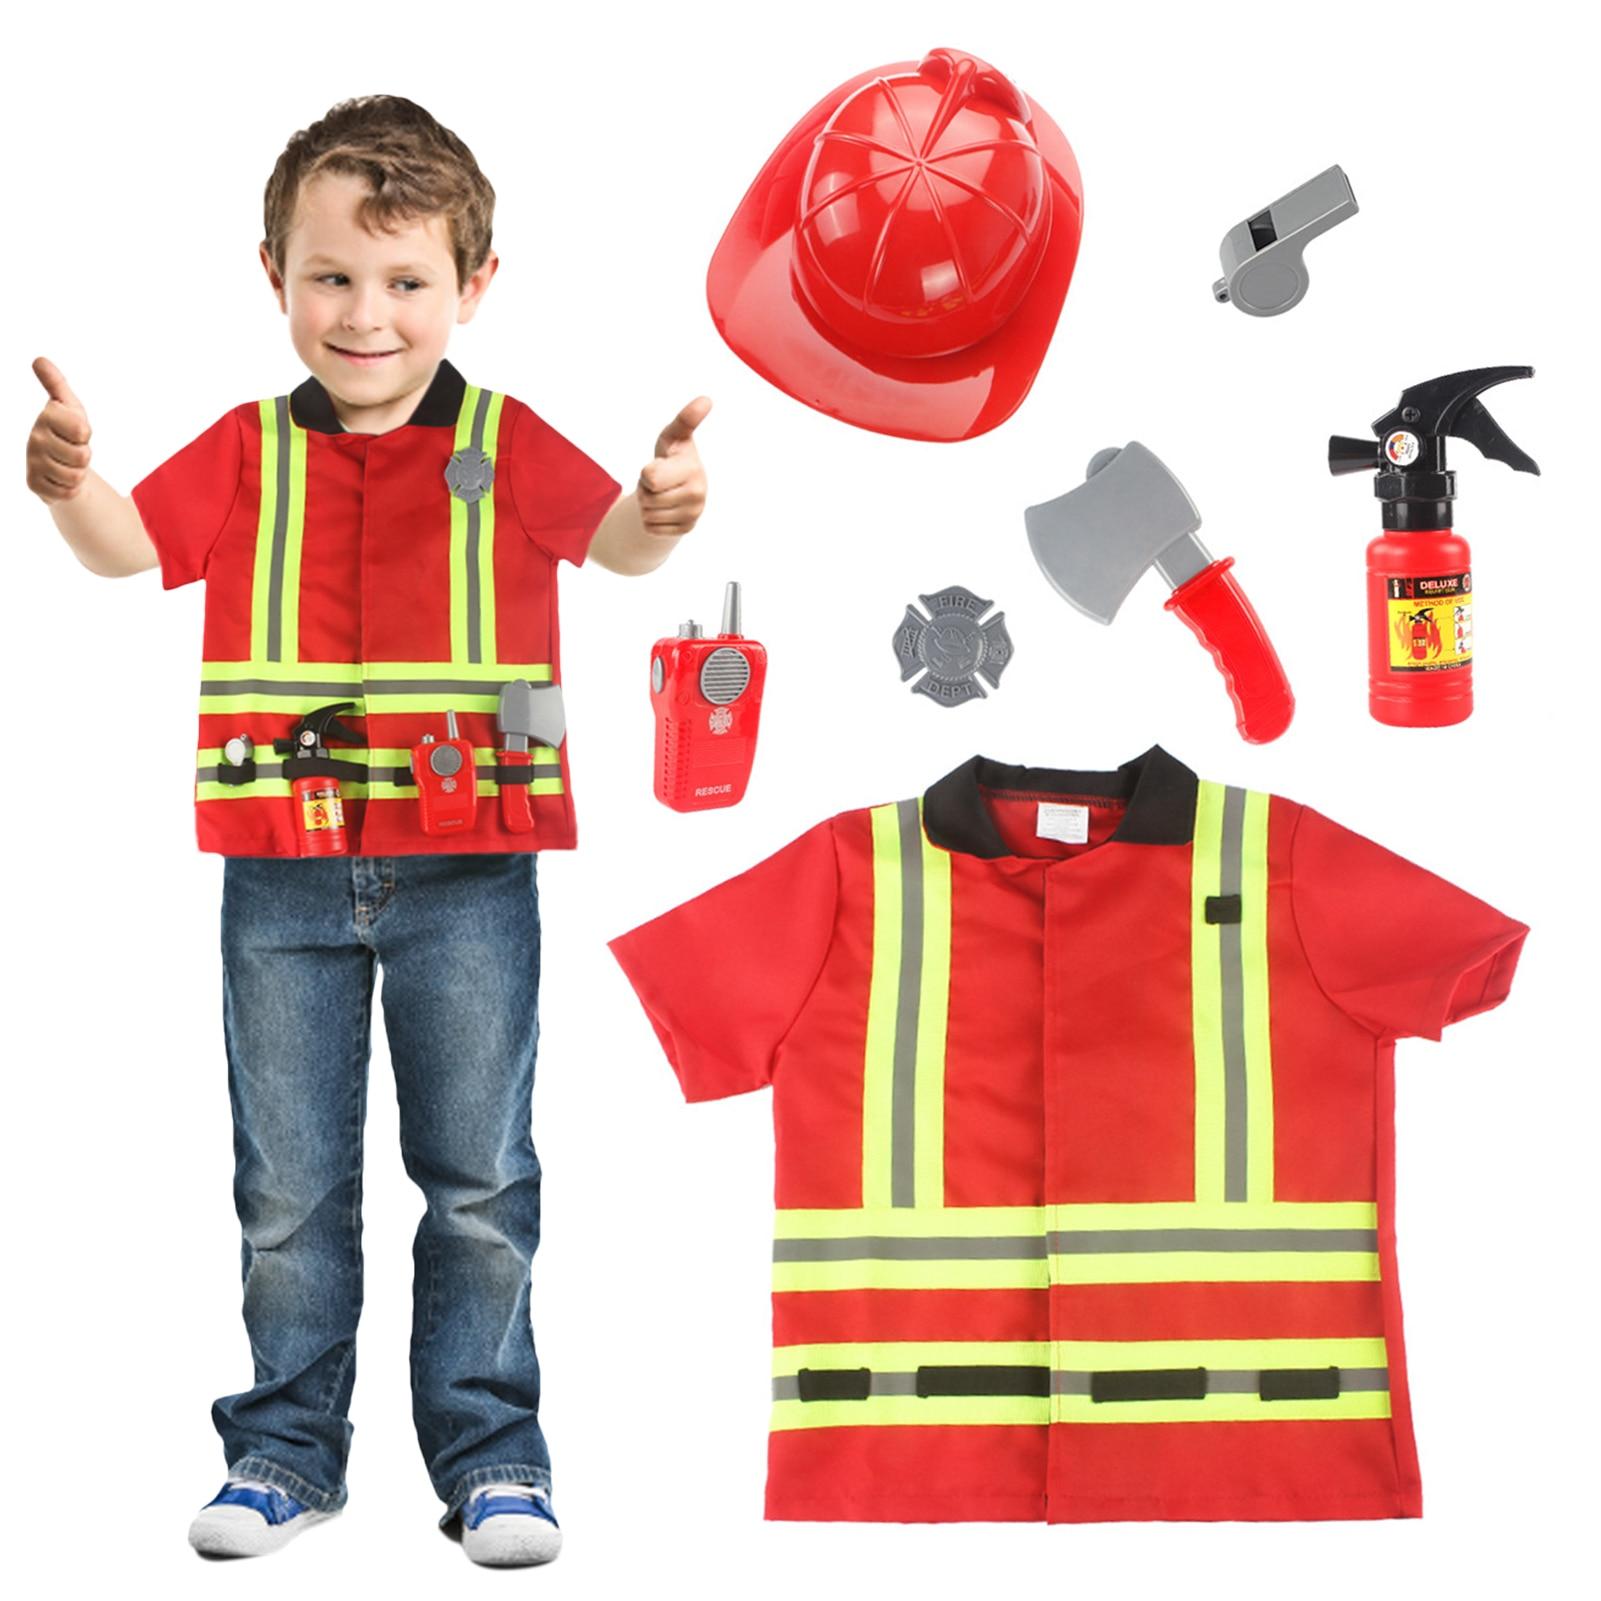 Фото - 7PCS Kids Fireman Costume Movable Visor Pretend Toy Fun Firefighter Role Play Clothes Firefighter Dress Up Role Play Accessories fun boys girls mini telephone developmental toy role play pretend toy communication equipment